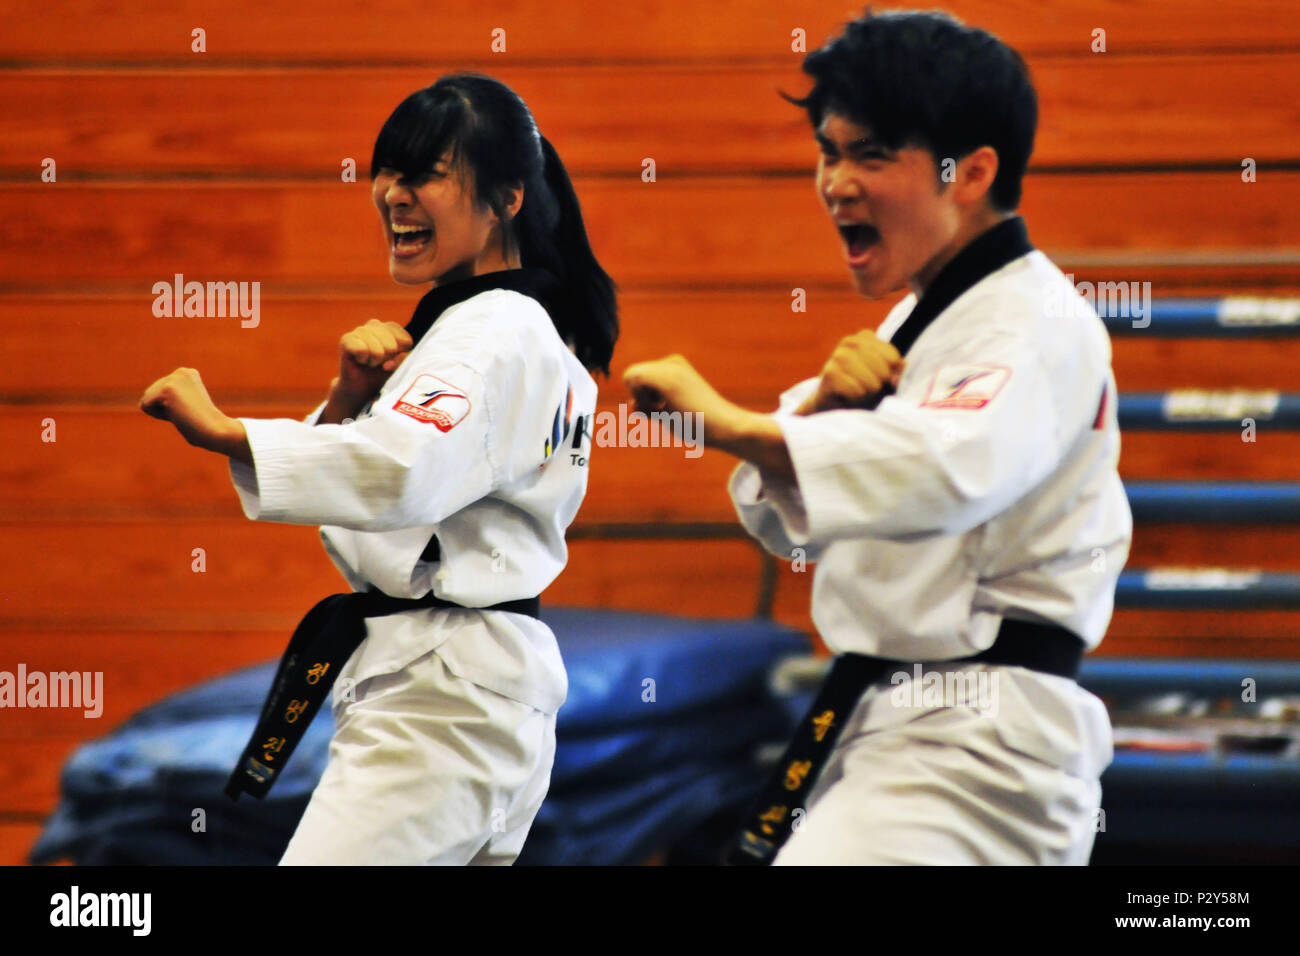 Touring Of Martial Arts Dojo